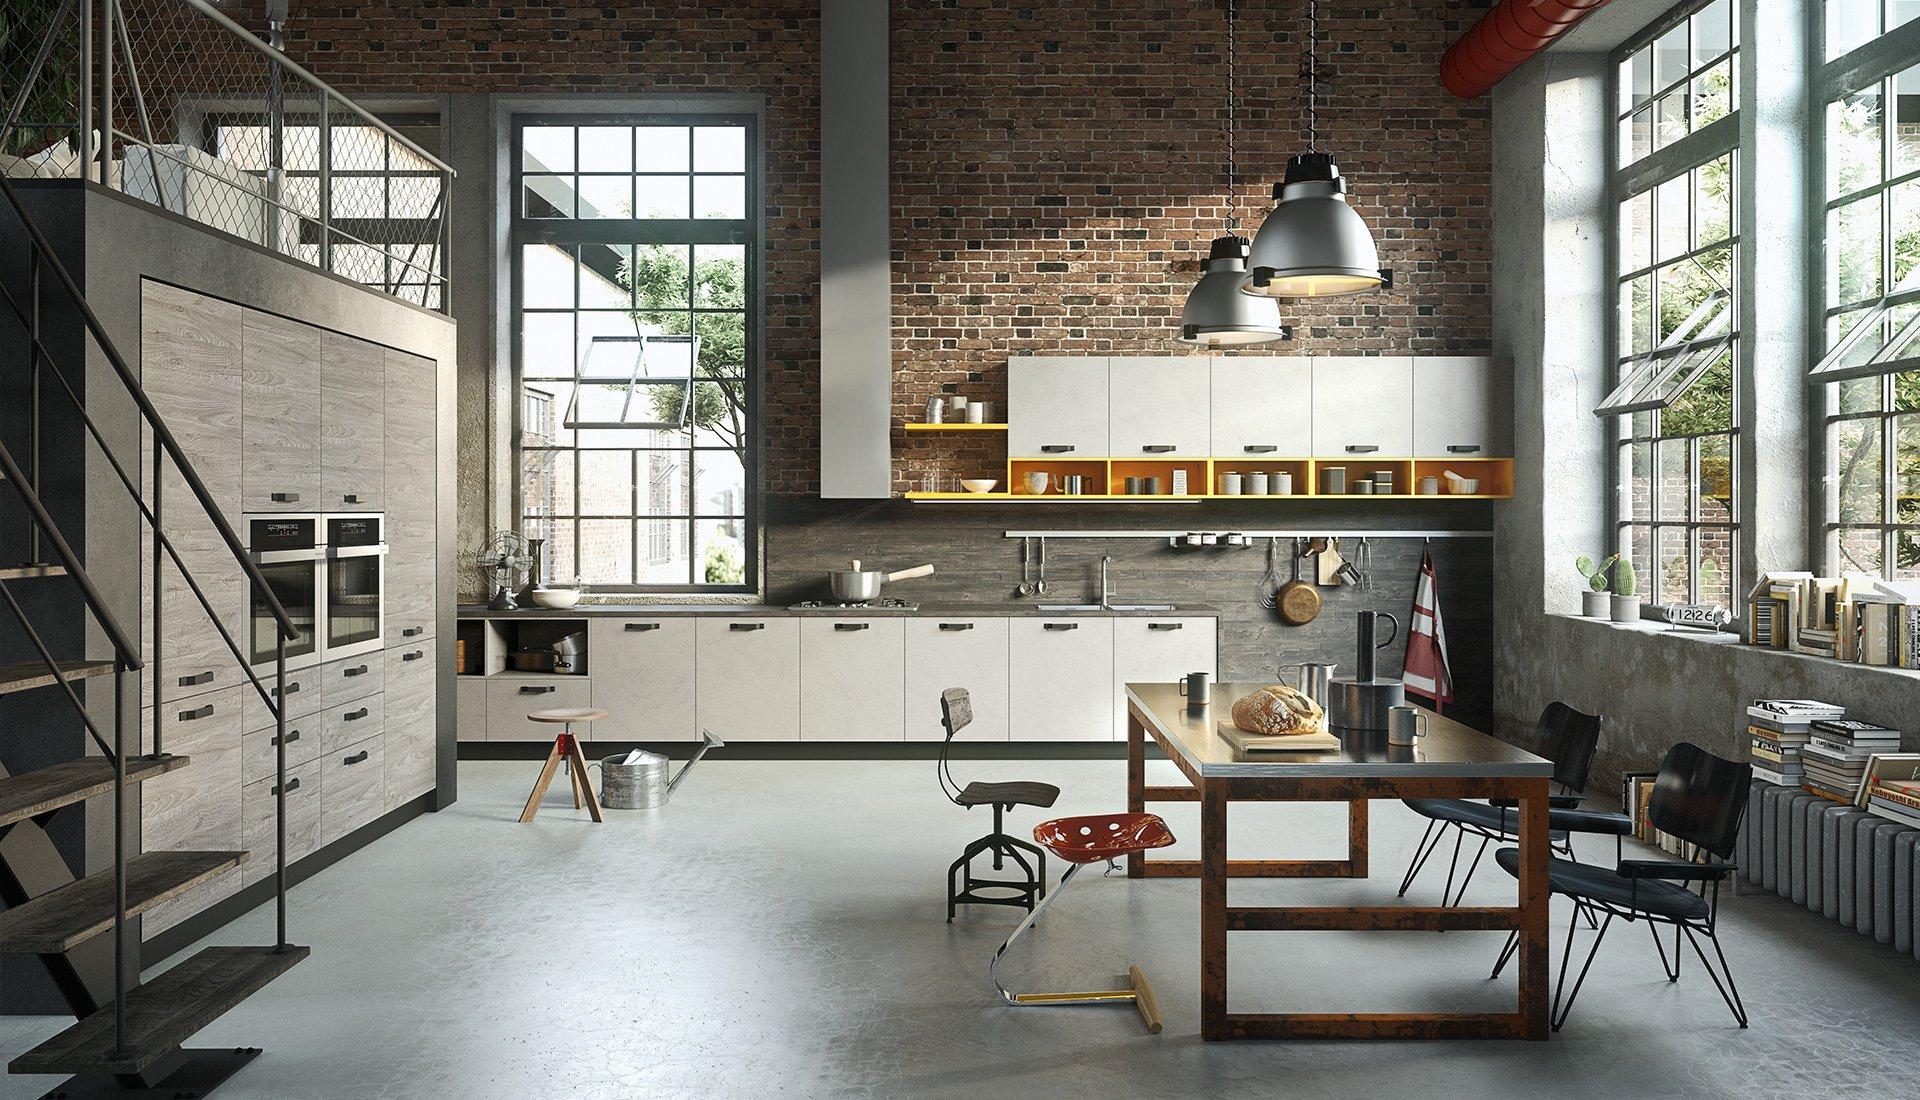 Cucine Componibili Macerata.Arredamento Cucine Moderne Arredamento Cucine Macerata